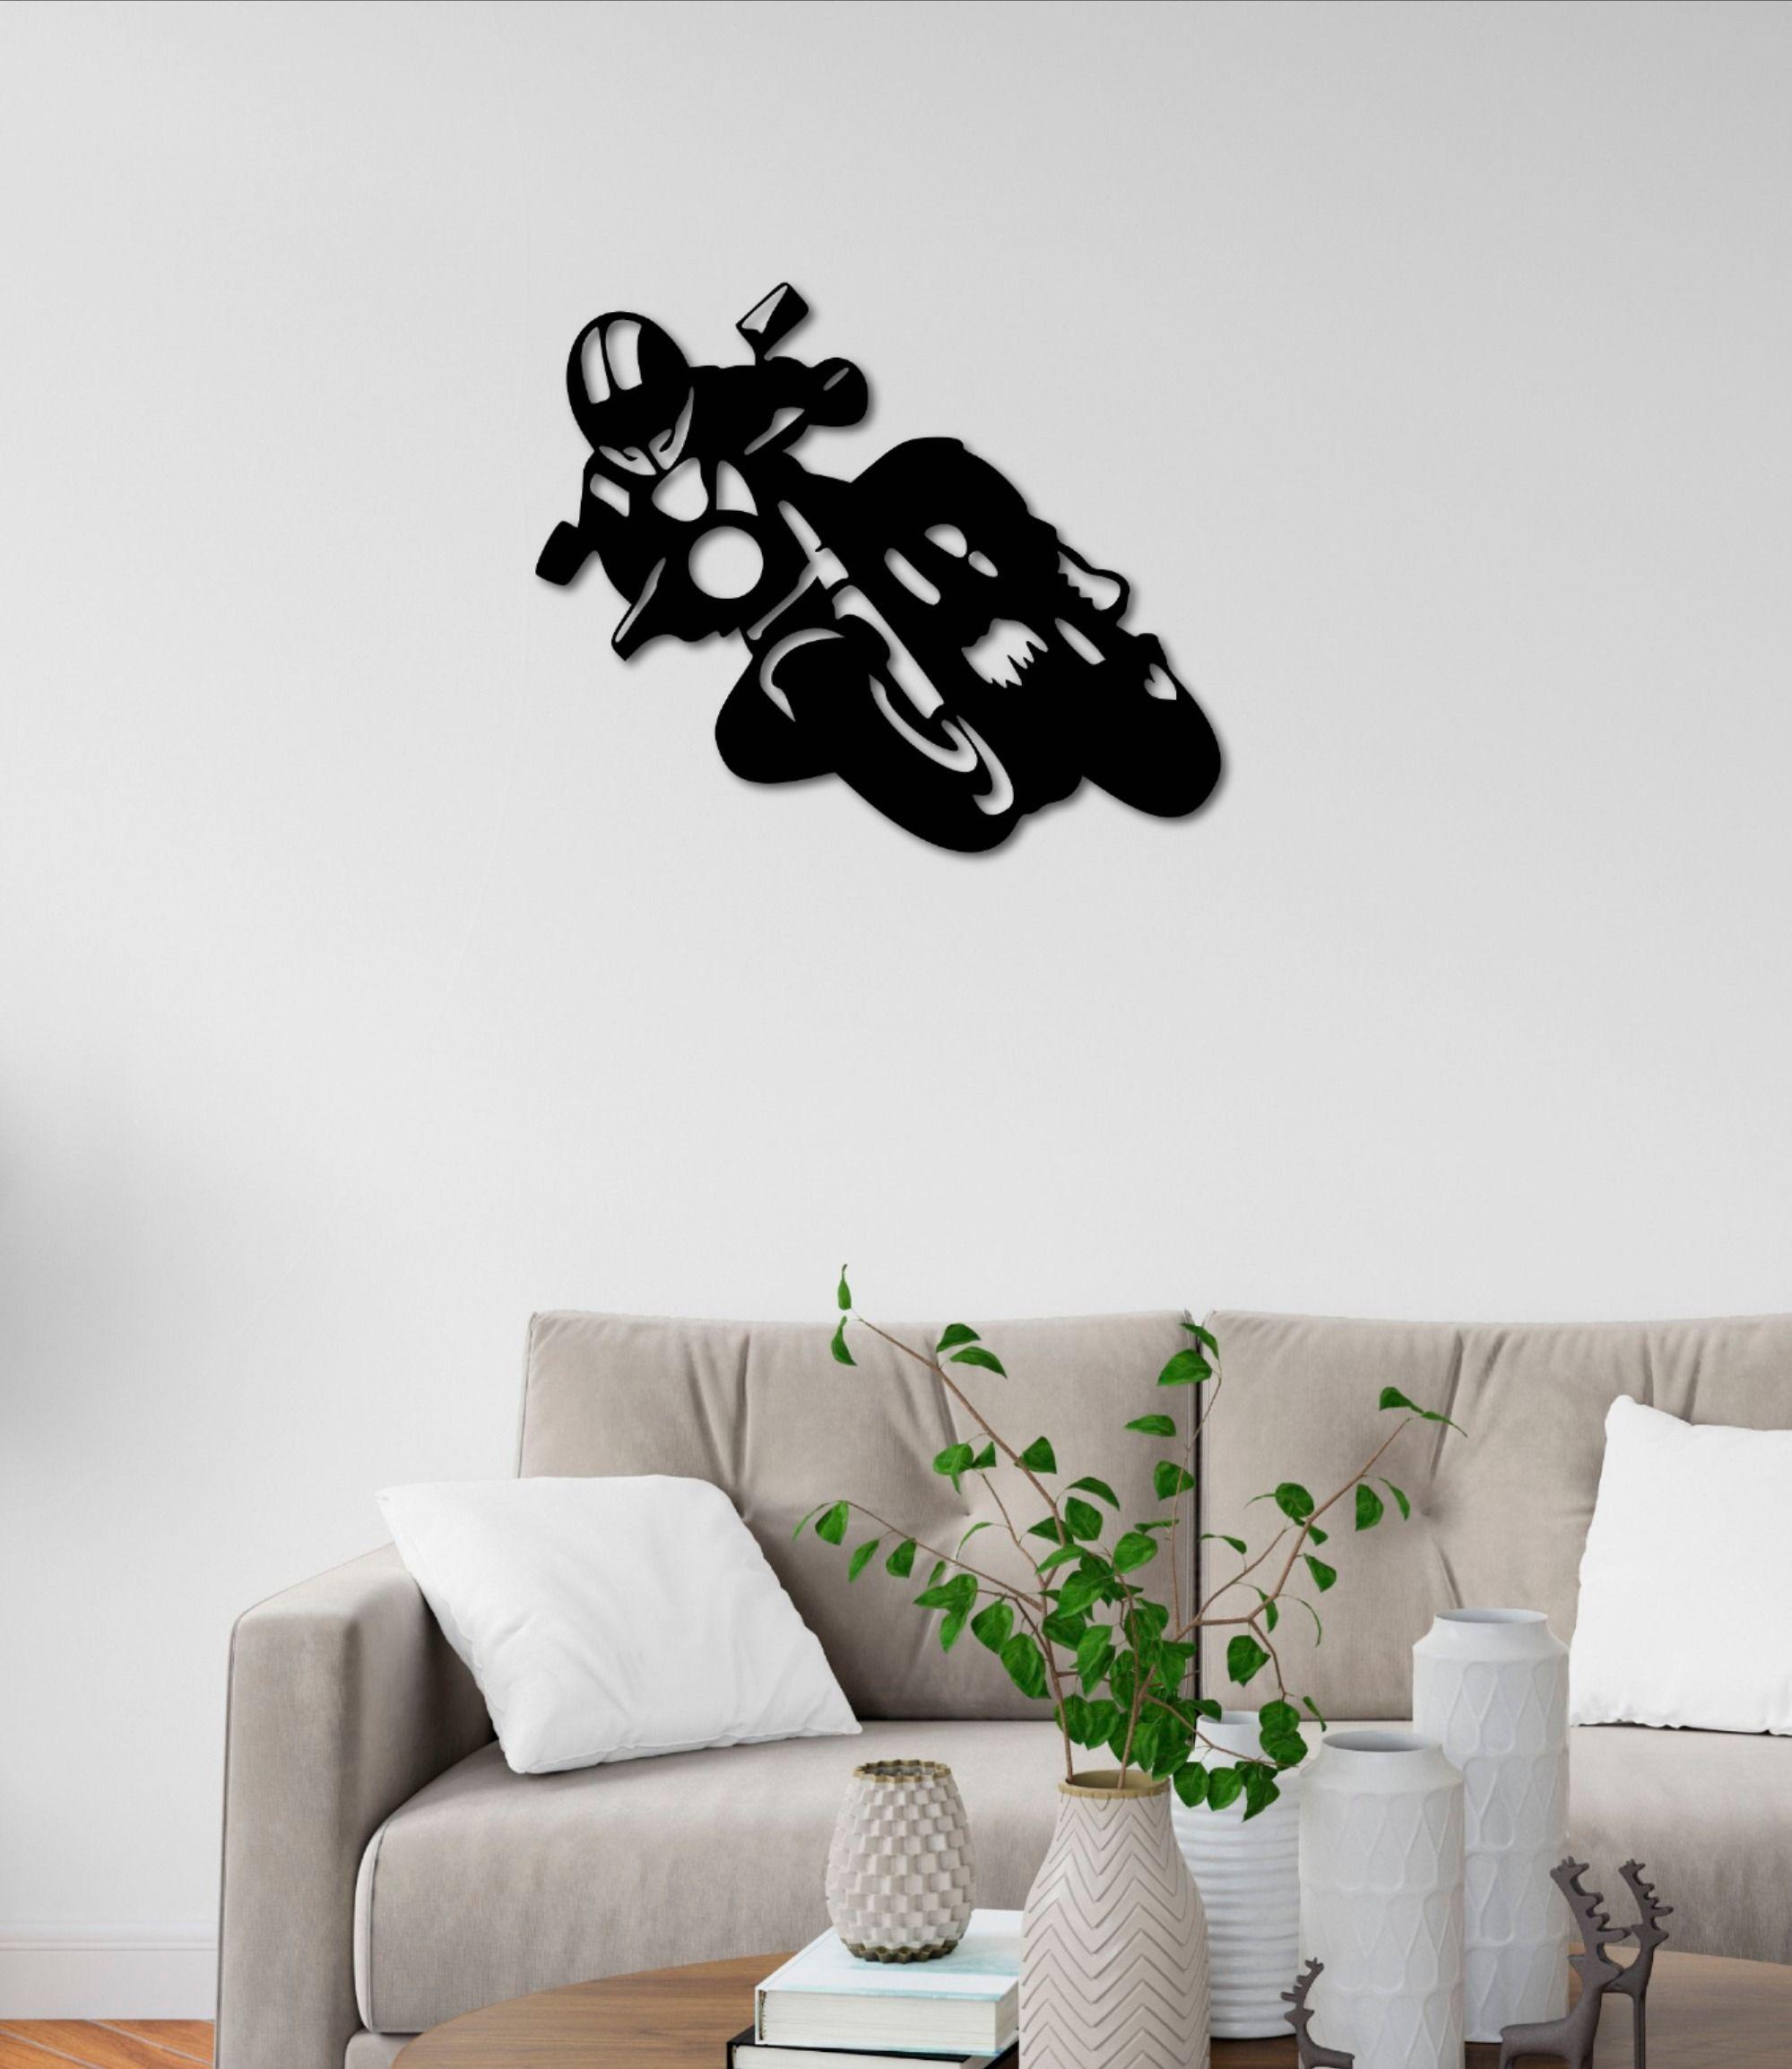 Motor Motorbike Metal Wall Art Decoration Gift In 23 5 Inch Customize It Metal Wall Art Wall Art Decor Metal Walls